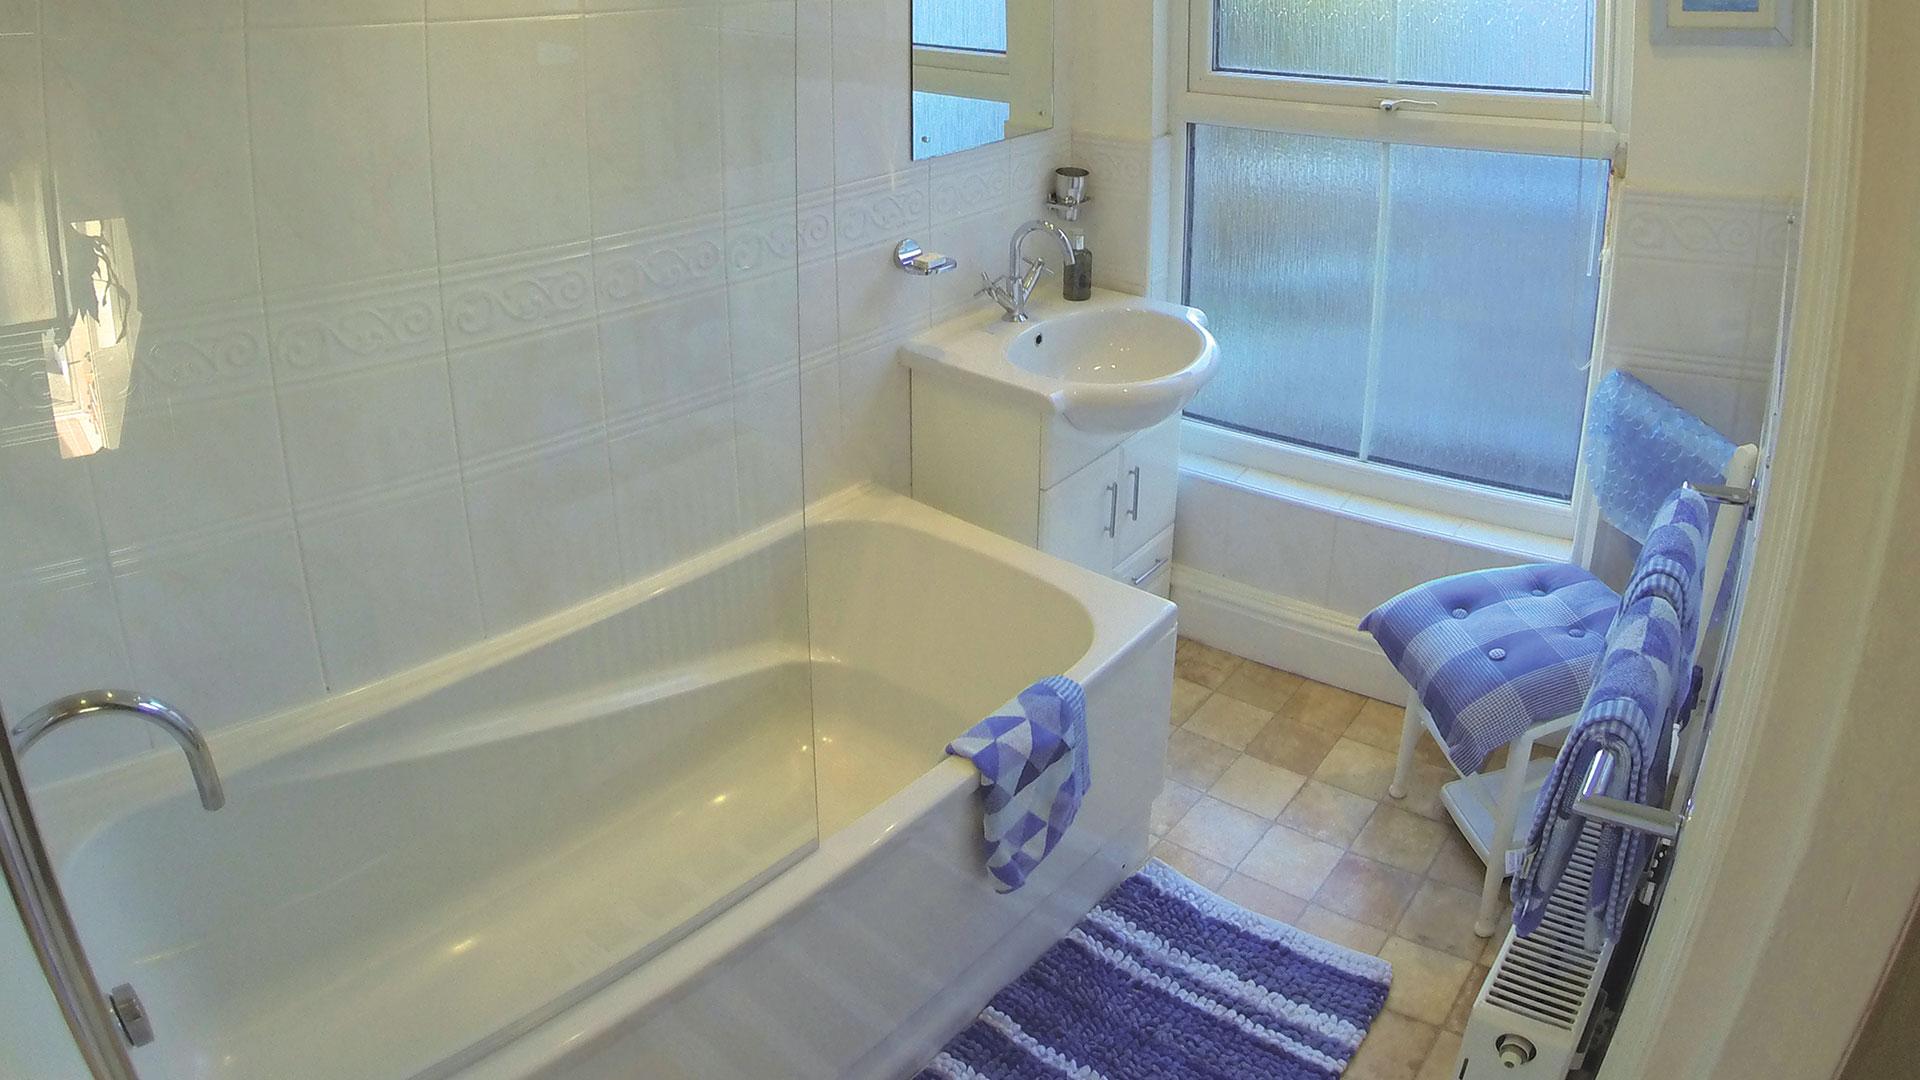 Bath-1920x1080.jpg